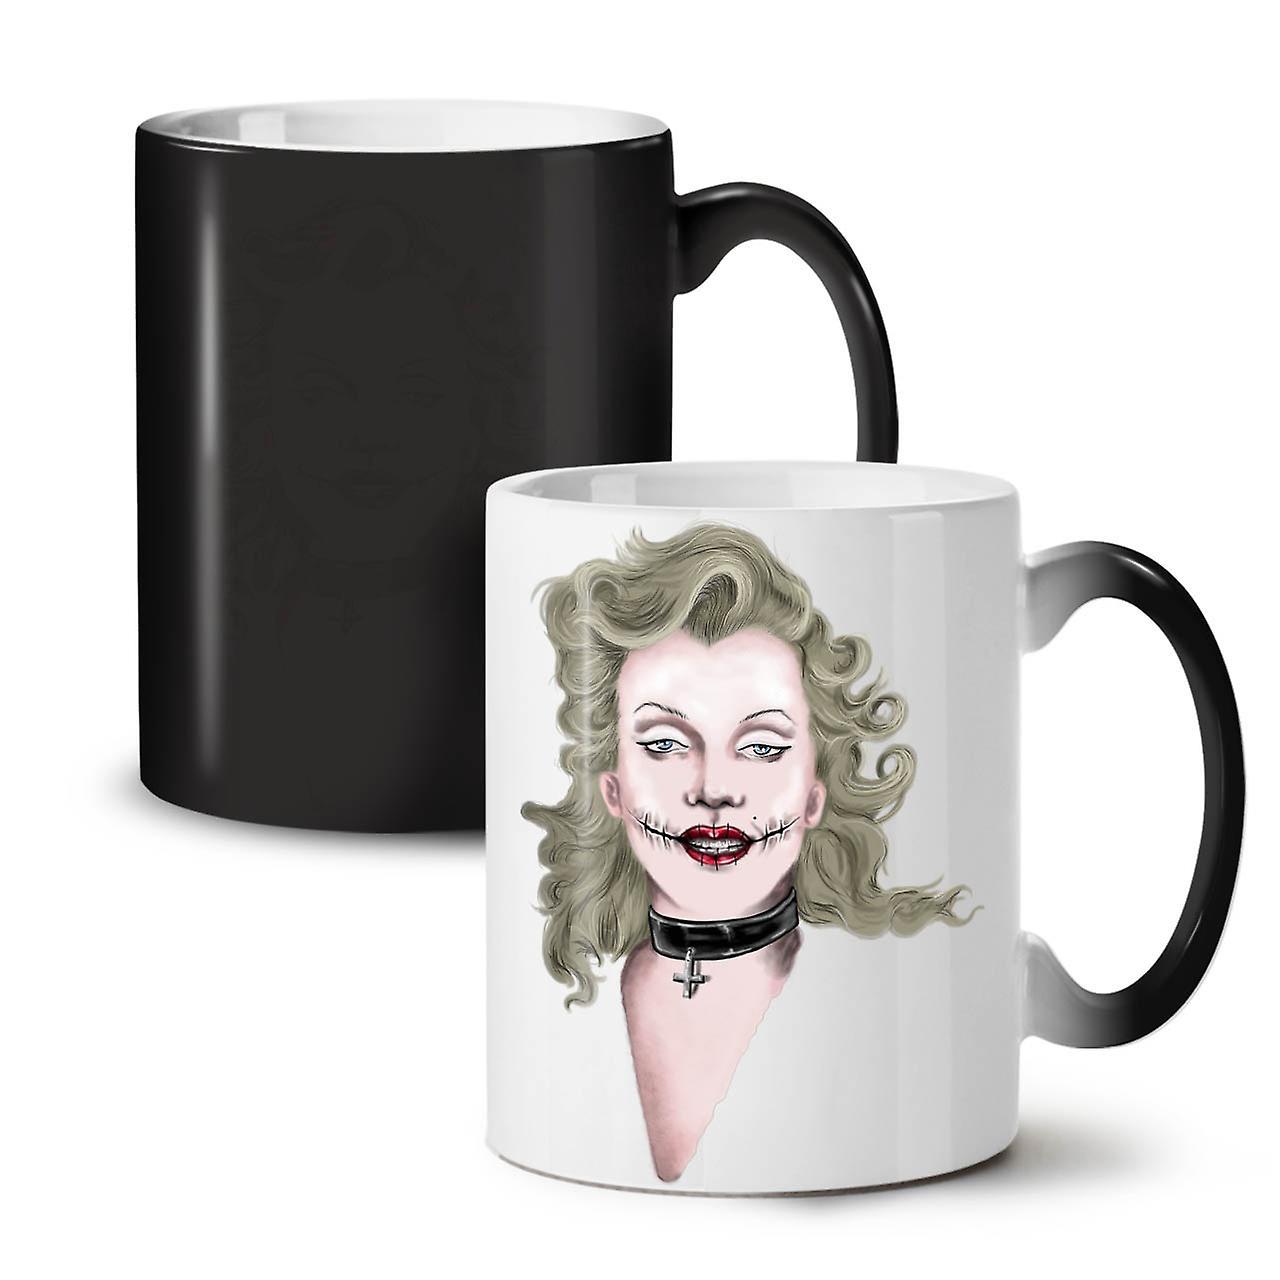 Tea Colour Ceramic Woman Art 11 Famous New Mug OzWellcoda Coffee Black Changing T1JcFKl